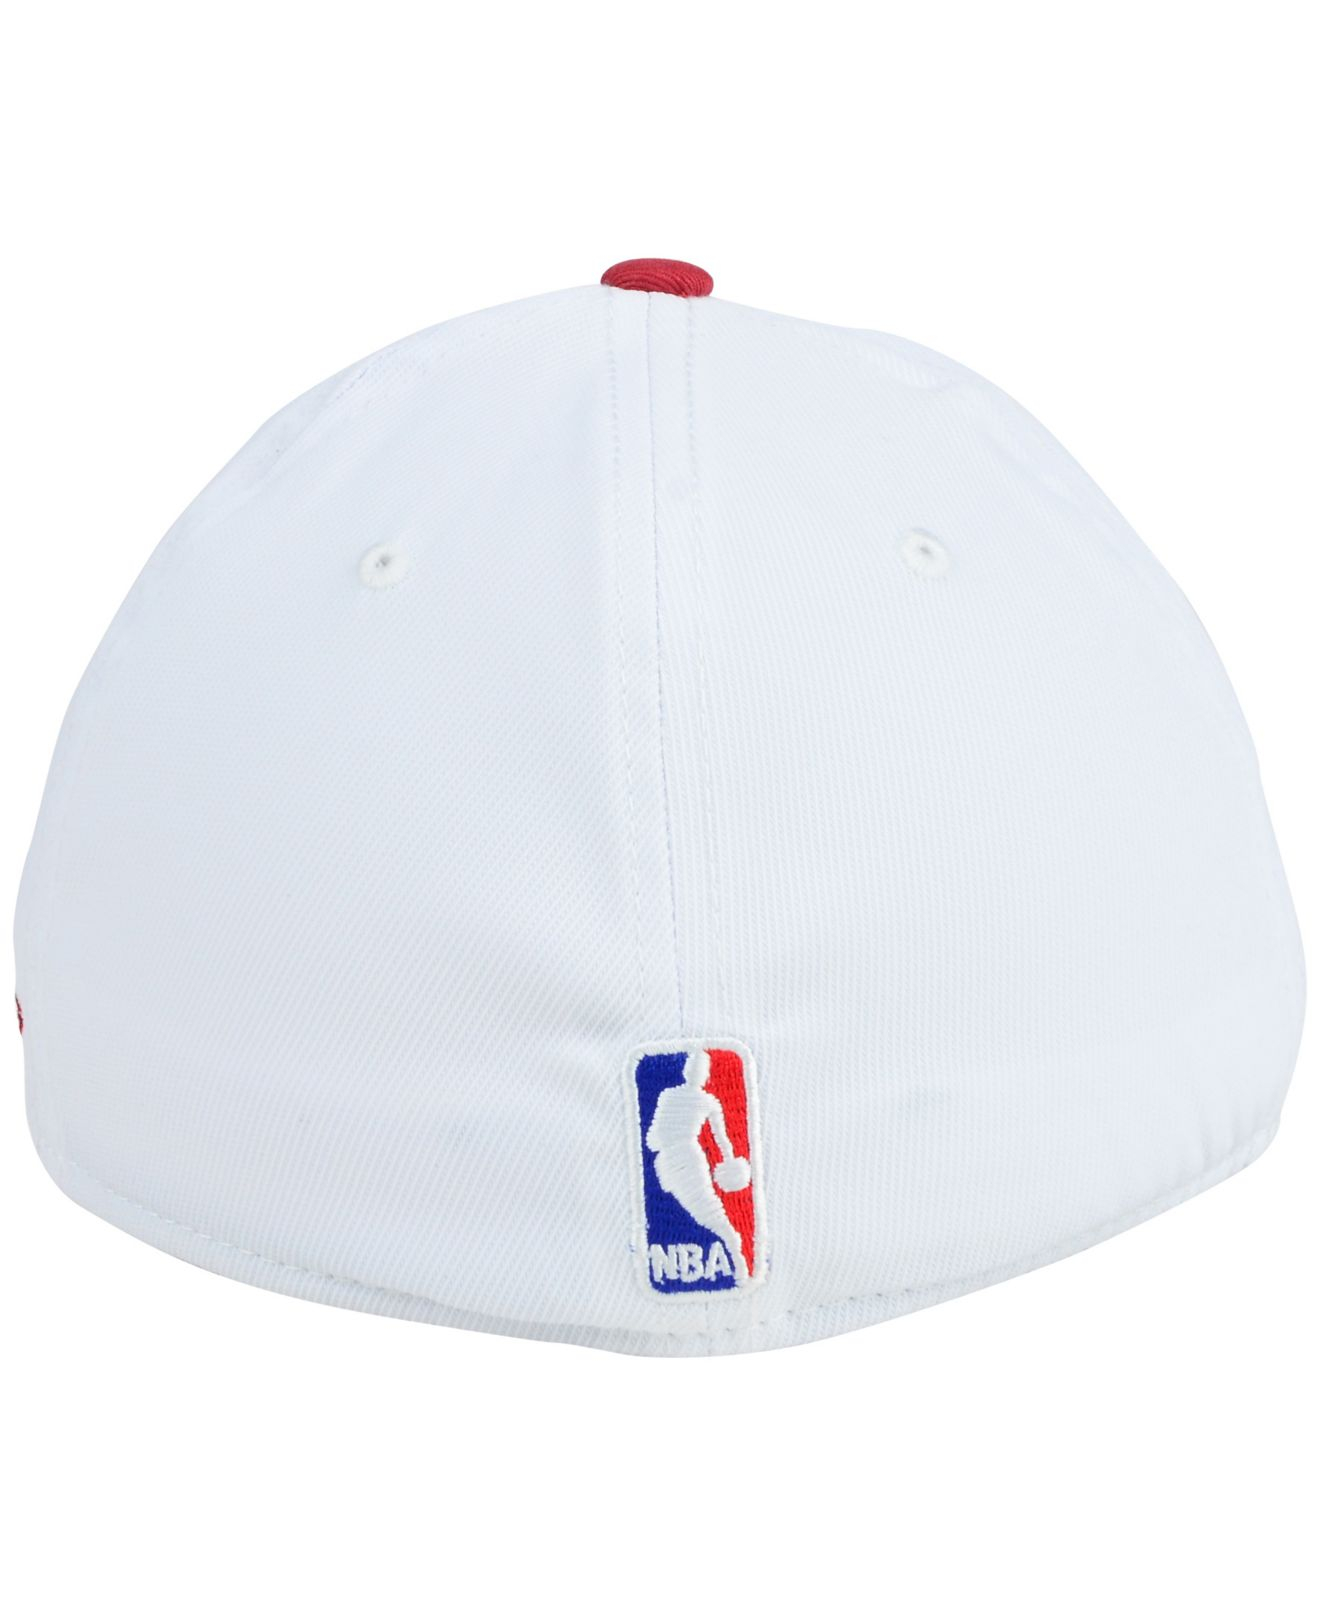 pretty nice 6a087 d5064 ... inexpensive lyst adidas miami heat nba timeout flex cap in white for  men ec6bc b0481